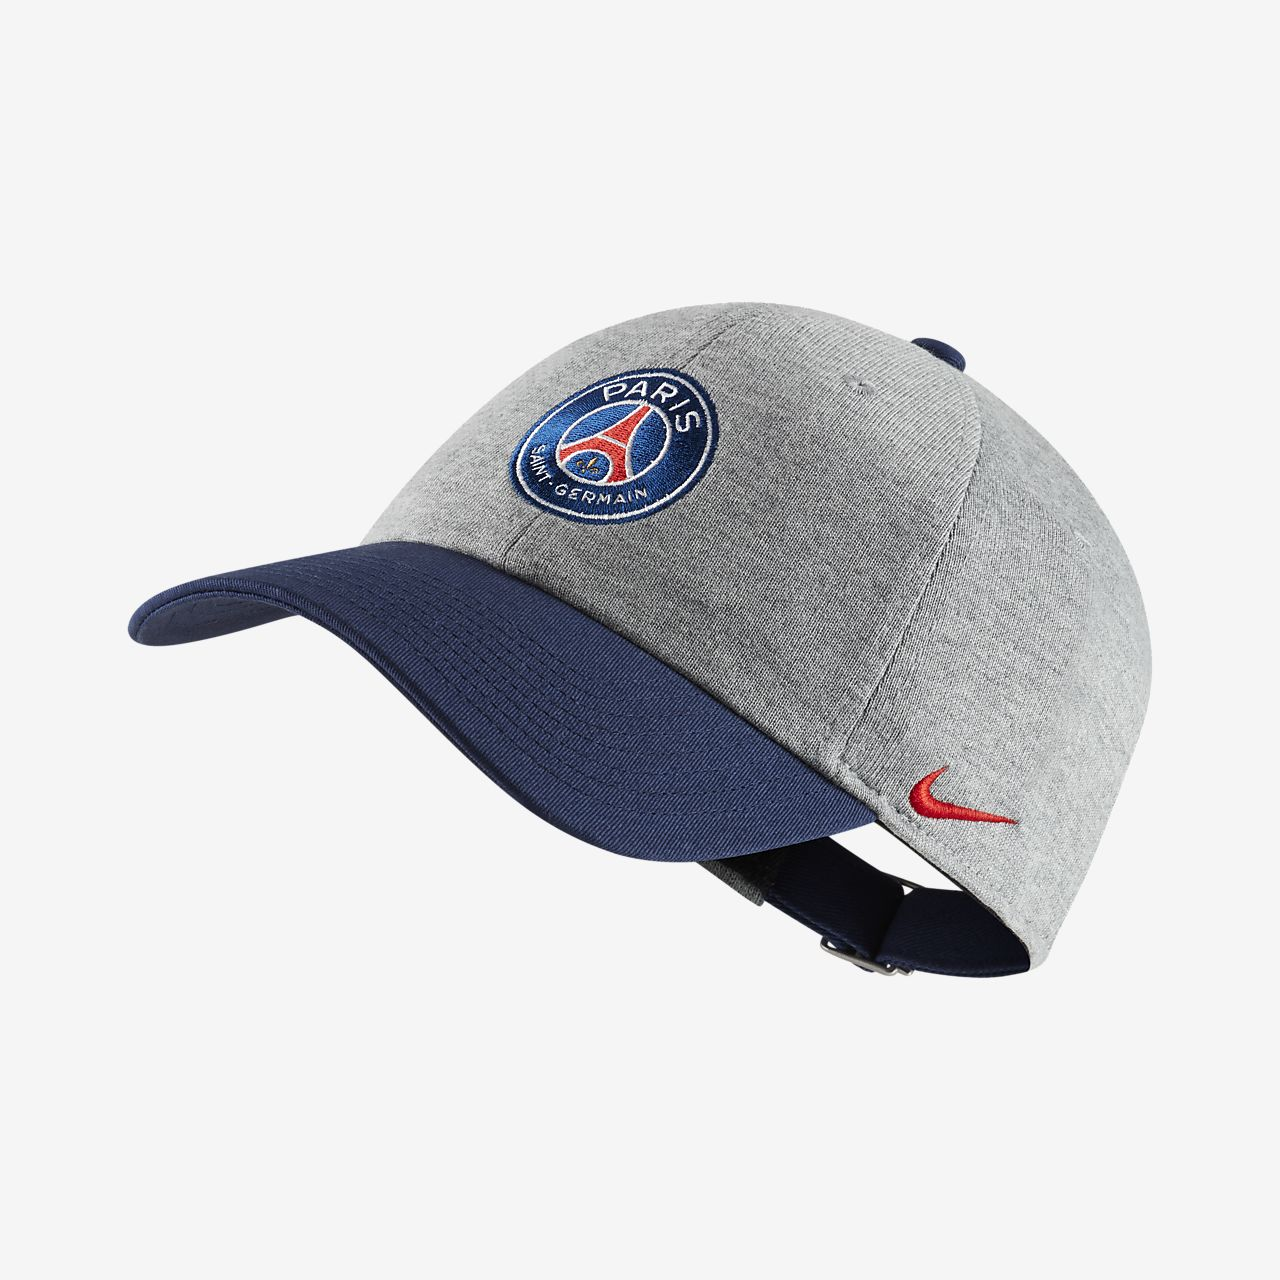 free shipping dd8a7 05494 Casquette réglable Paris Saint-Germain H86